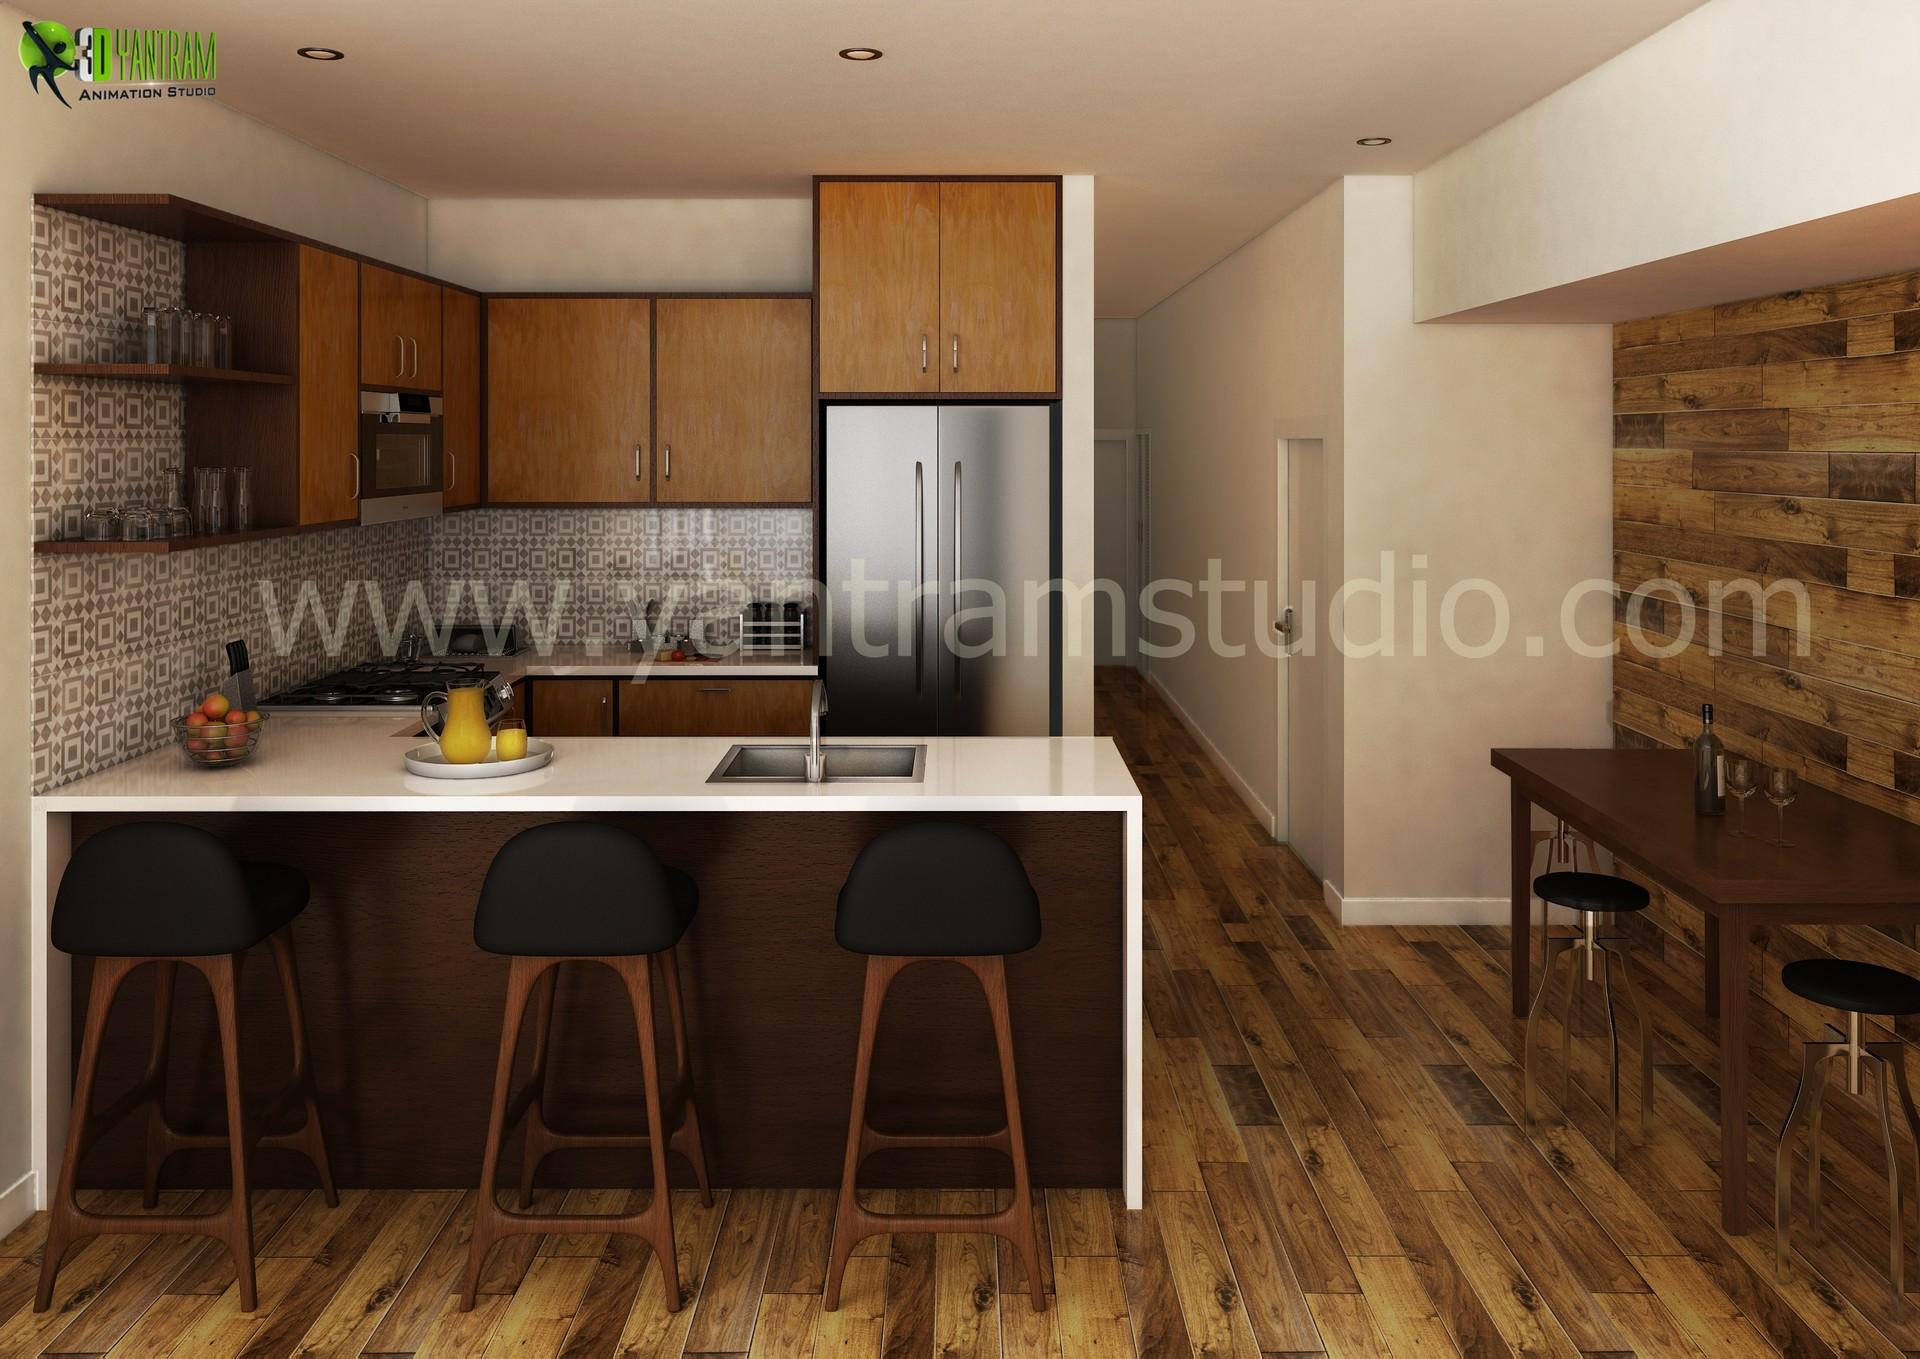 Artstation Awesome New 3d Kitchen Interior Design Dubai Yantram Architectural Design Studio